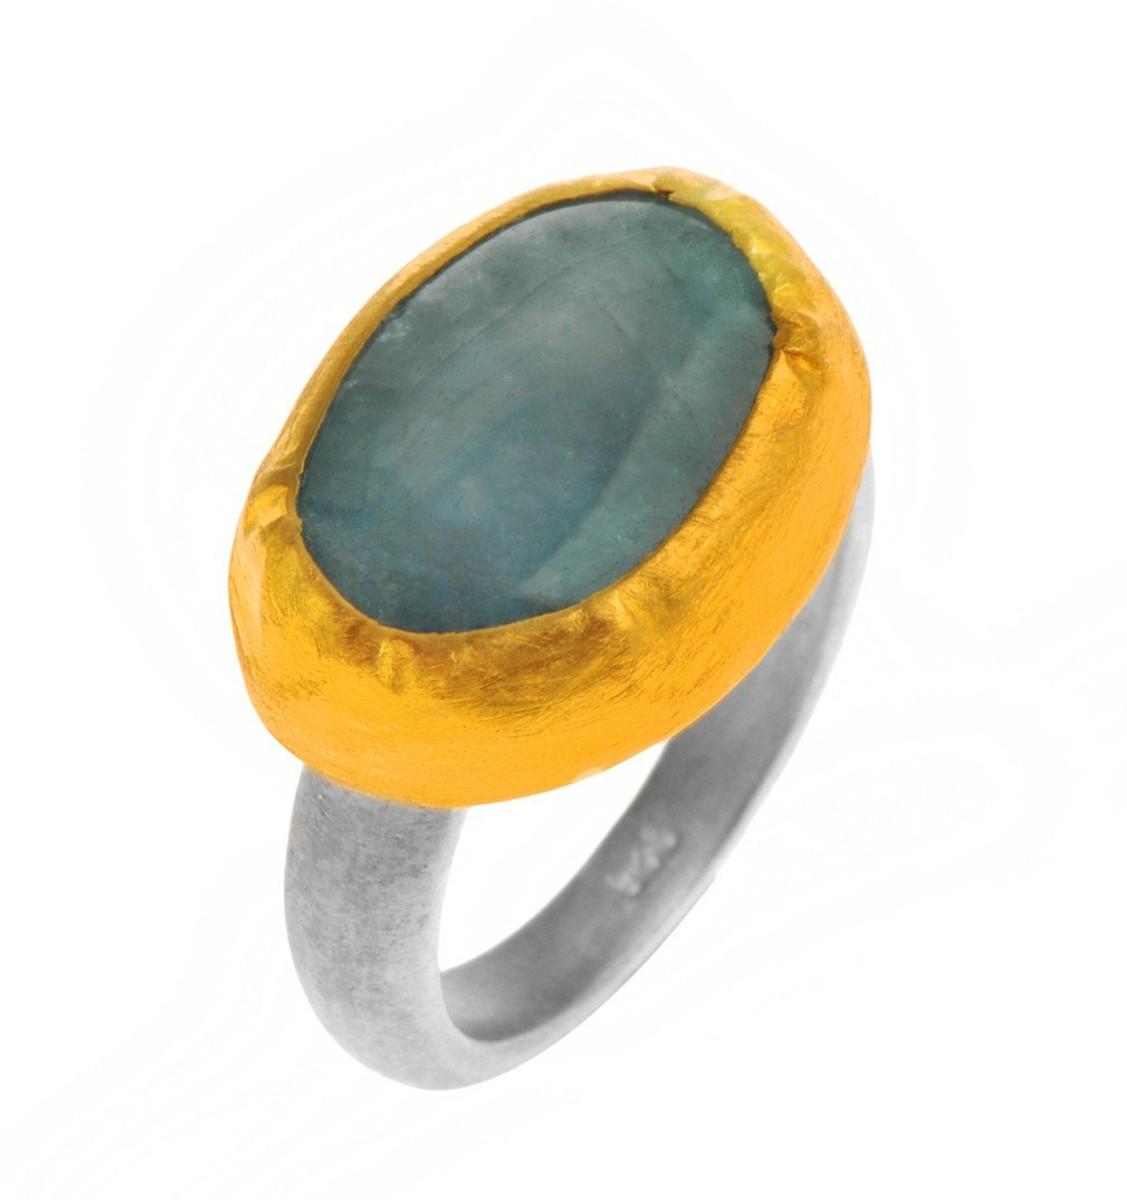 Artisan Aquamarine Ring - New Arrival